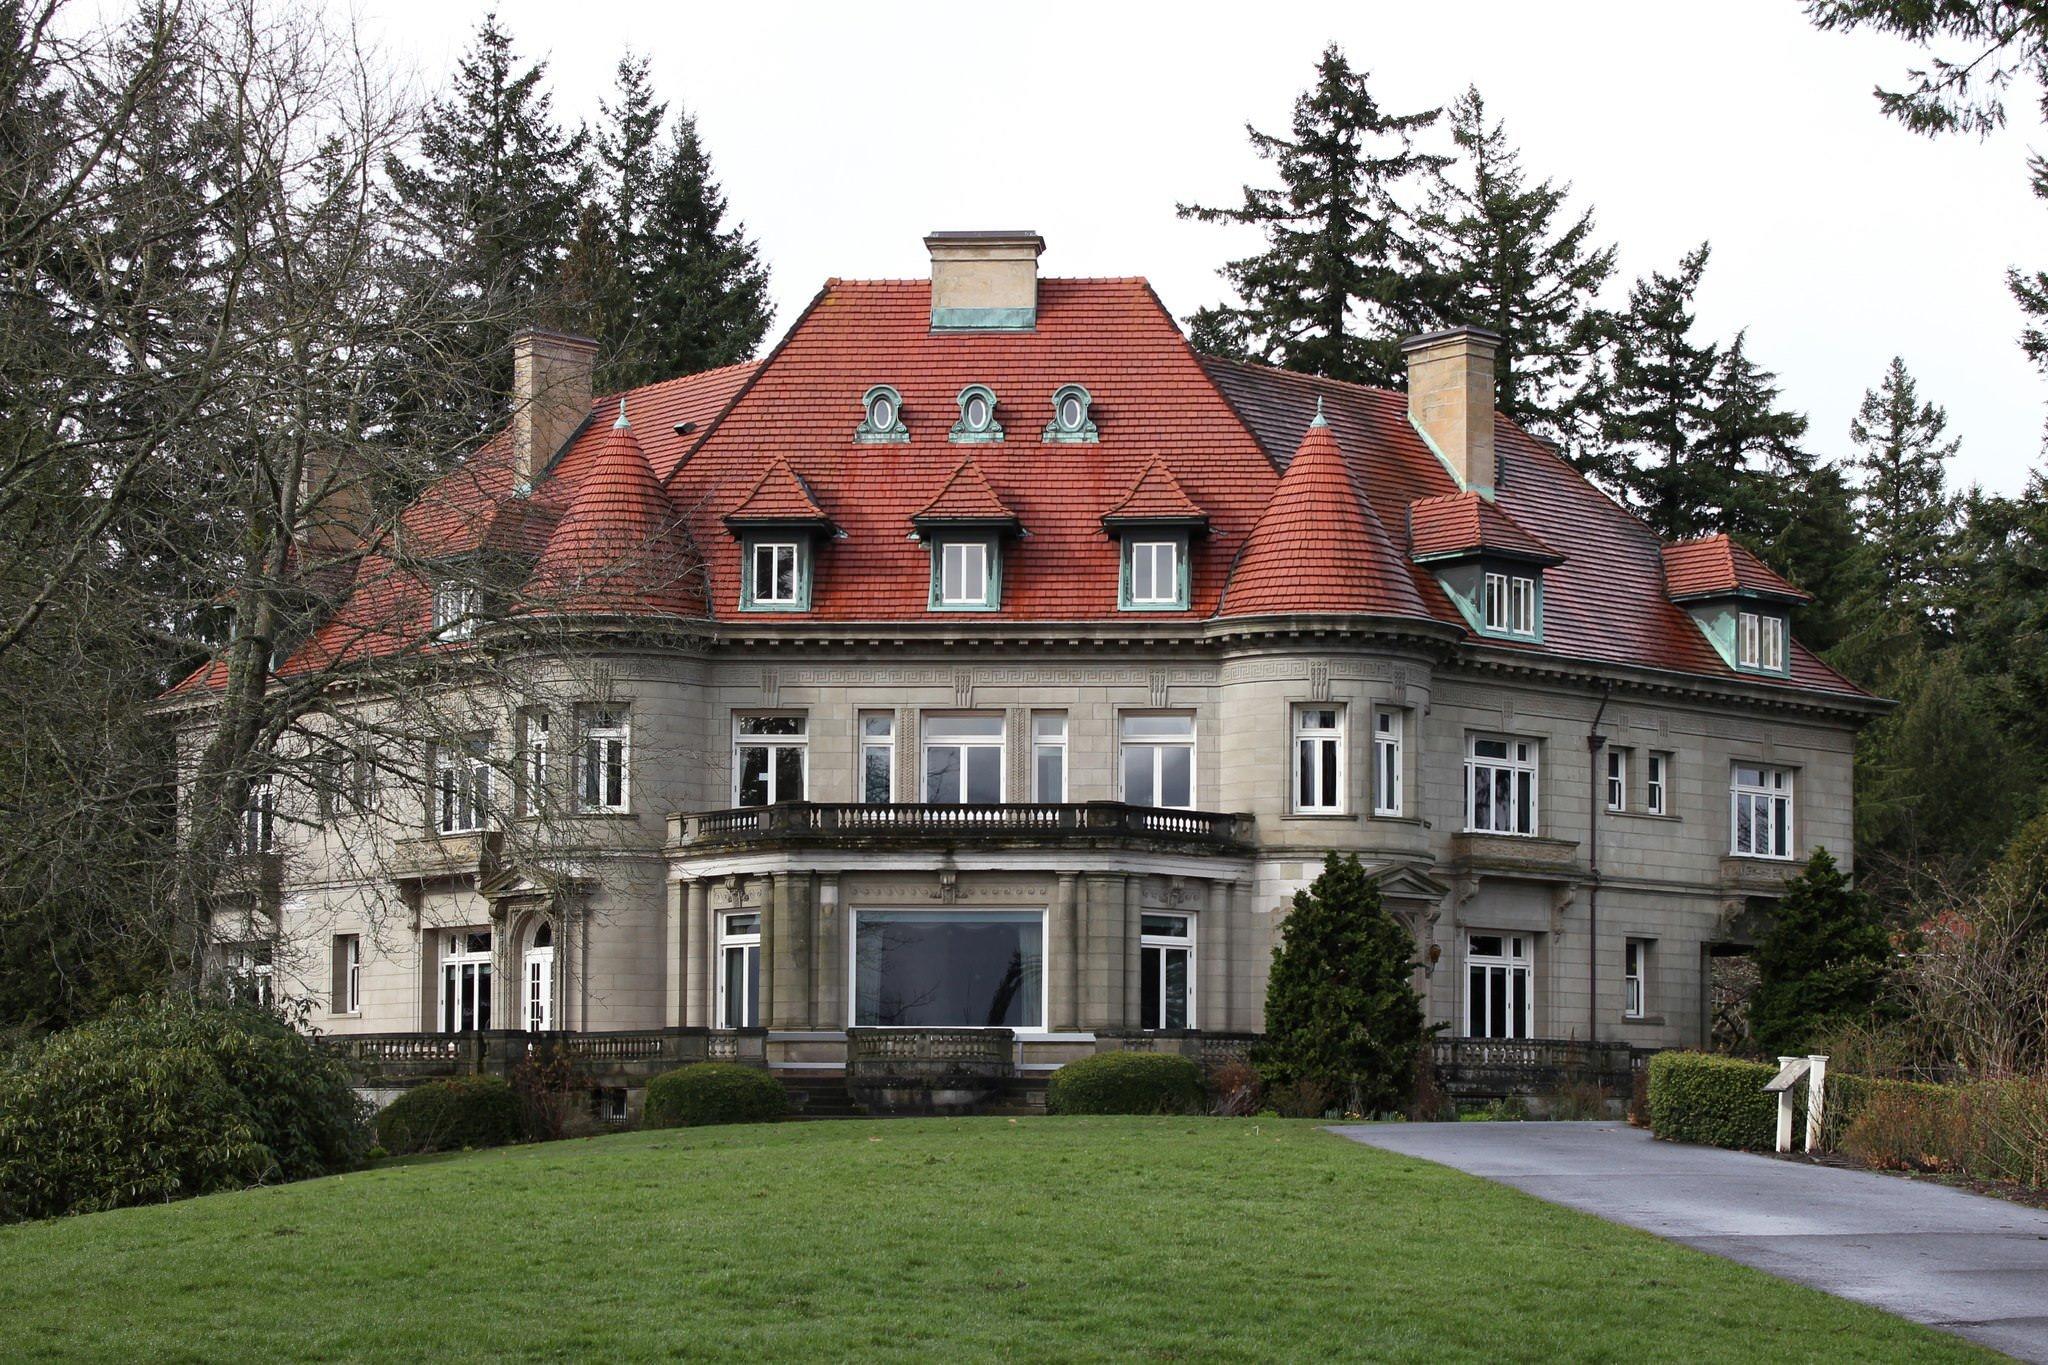 Portland S Historic Landmark Pittock Mansion Celebrates